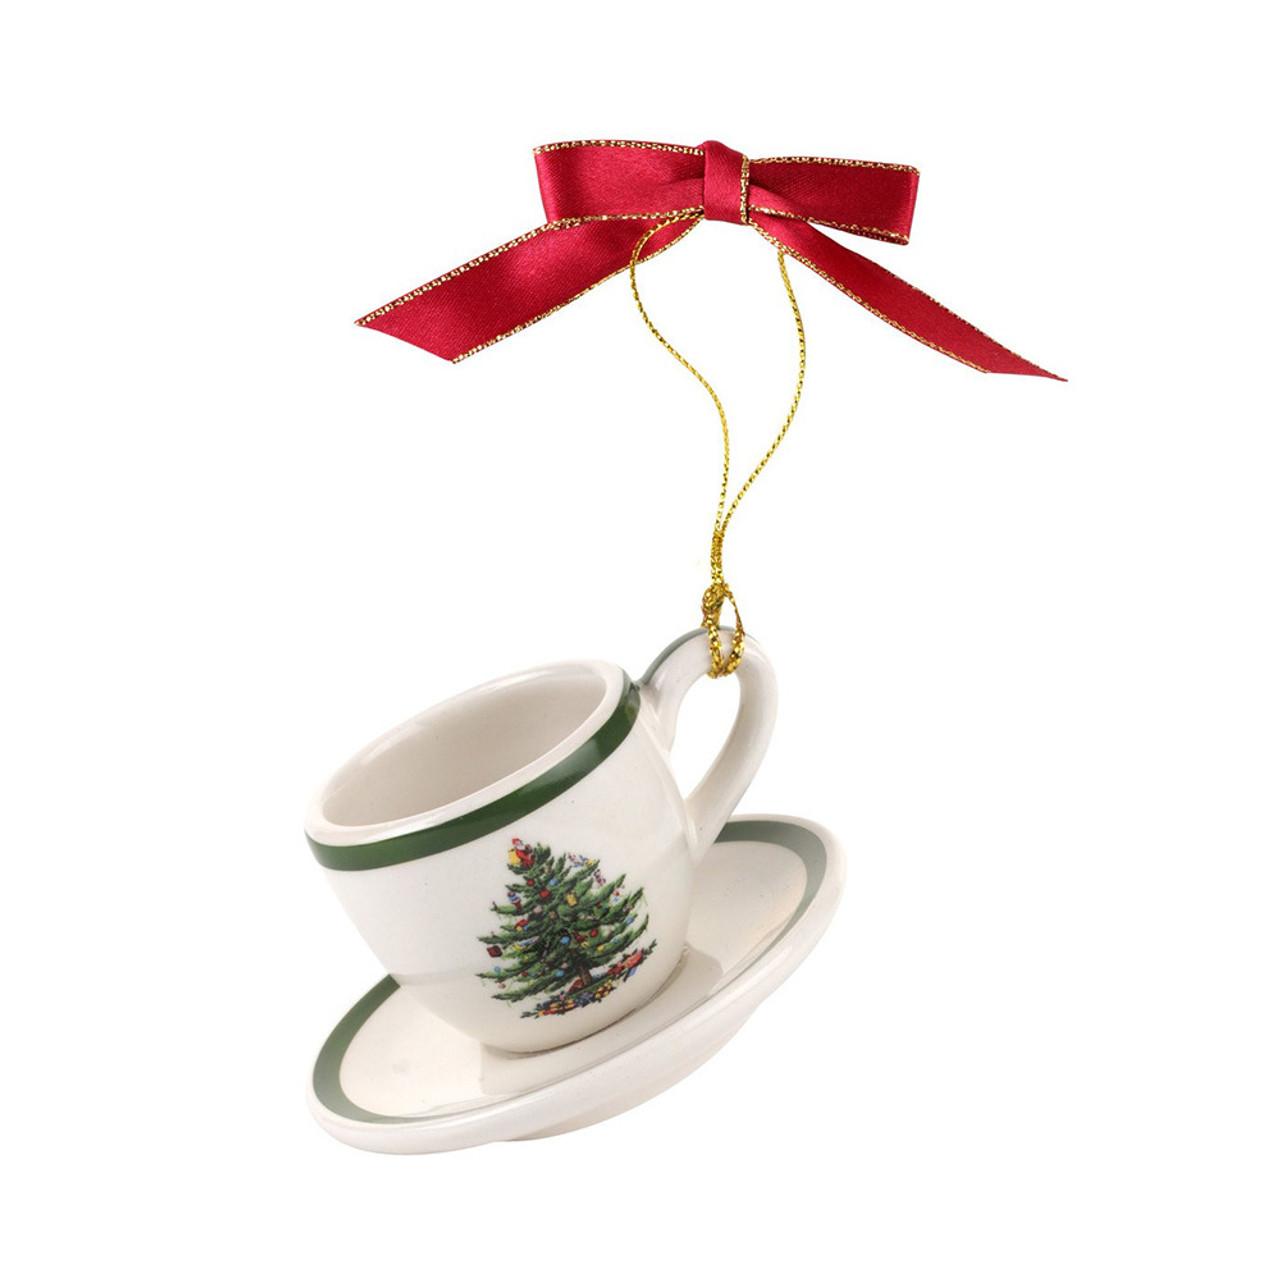 Spode Christmas Tree.Spode Christmas Tree Cup Saucer Ornament 7cm